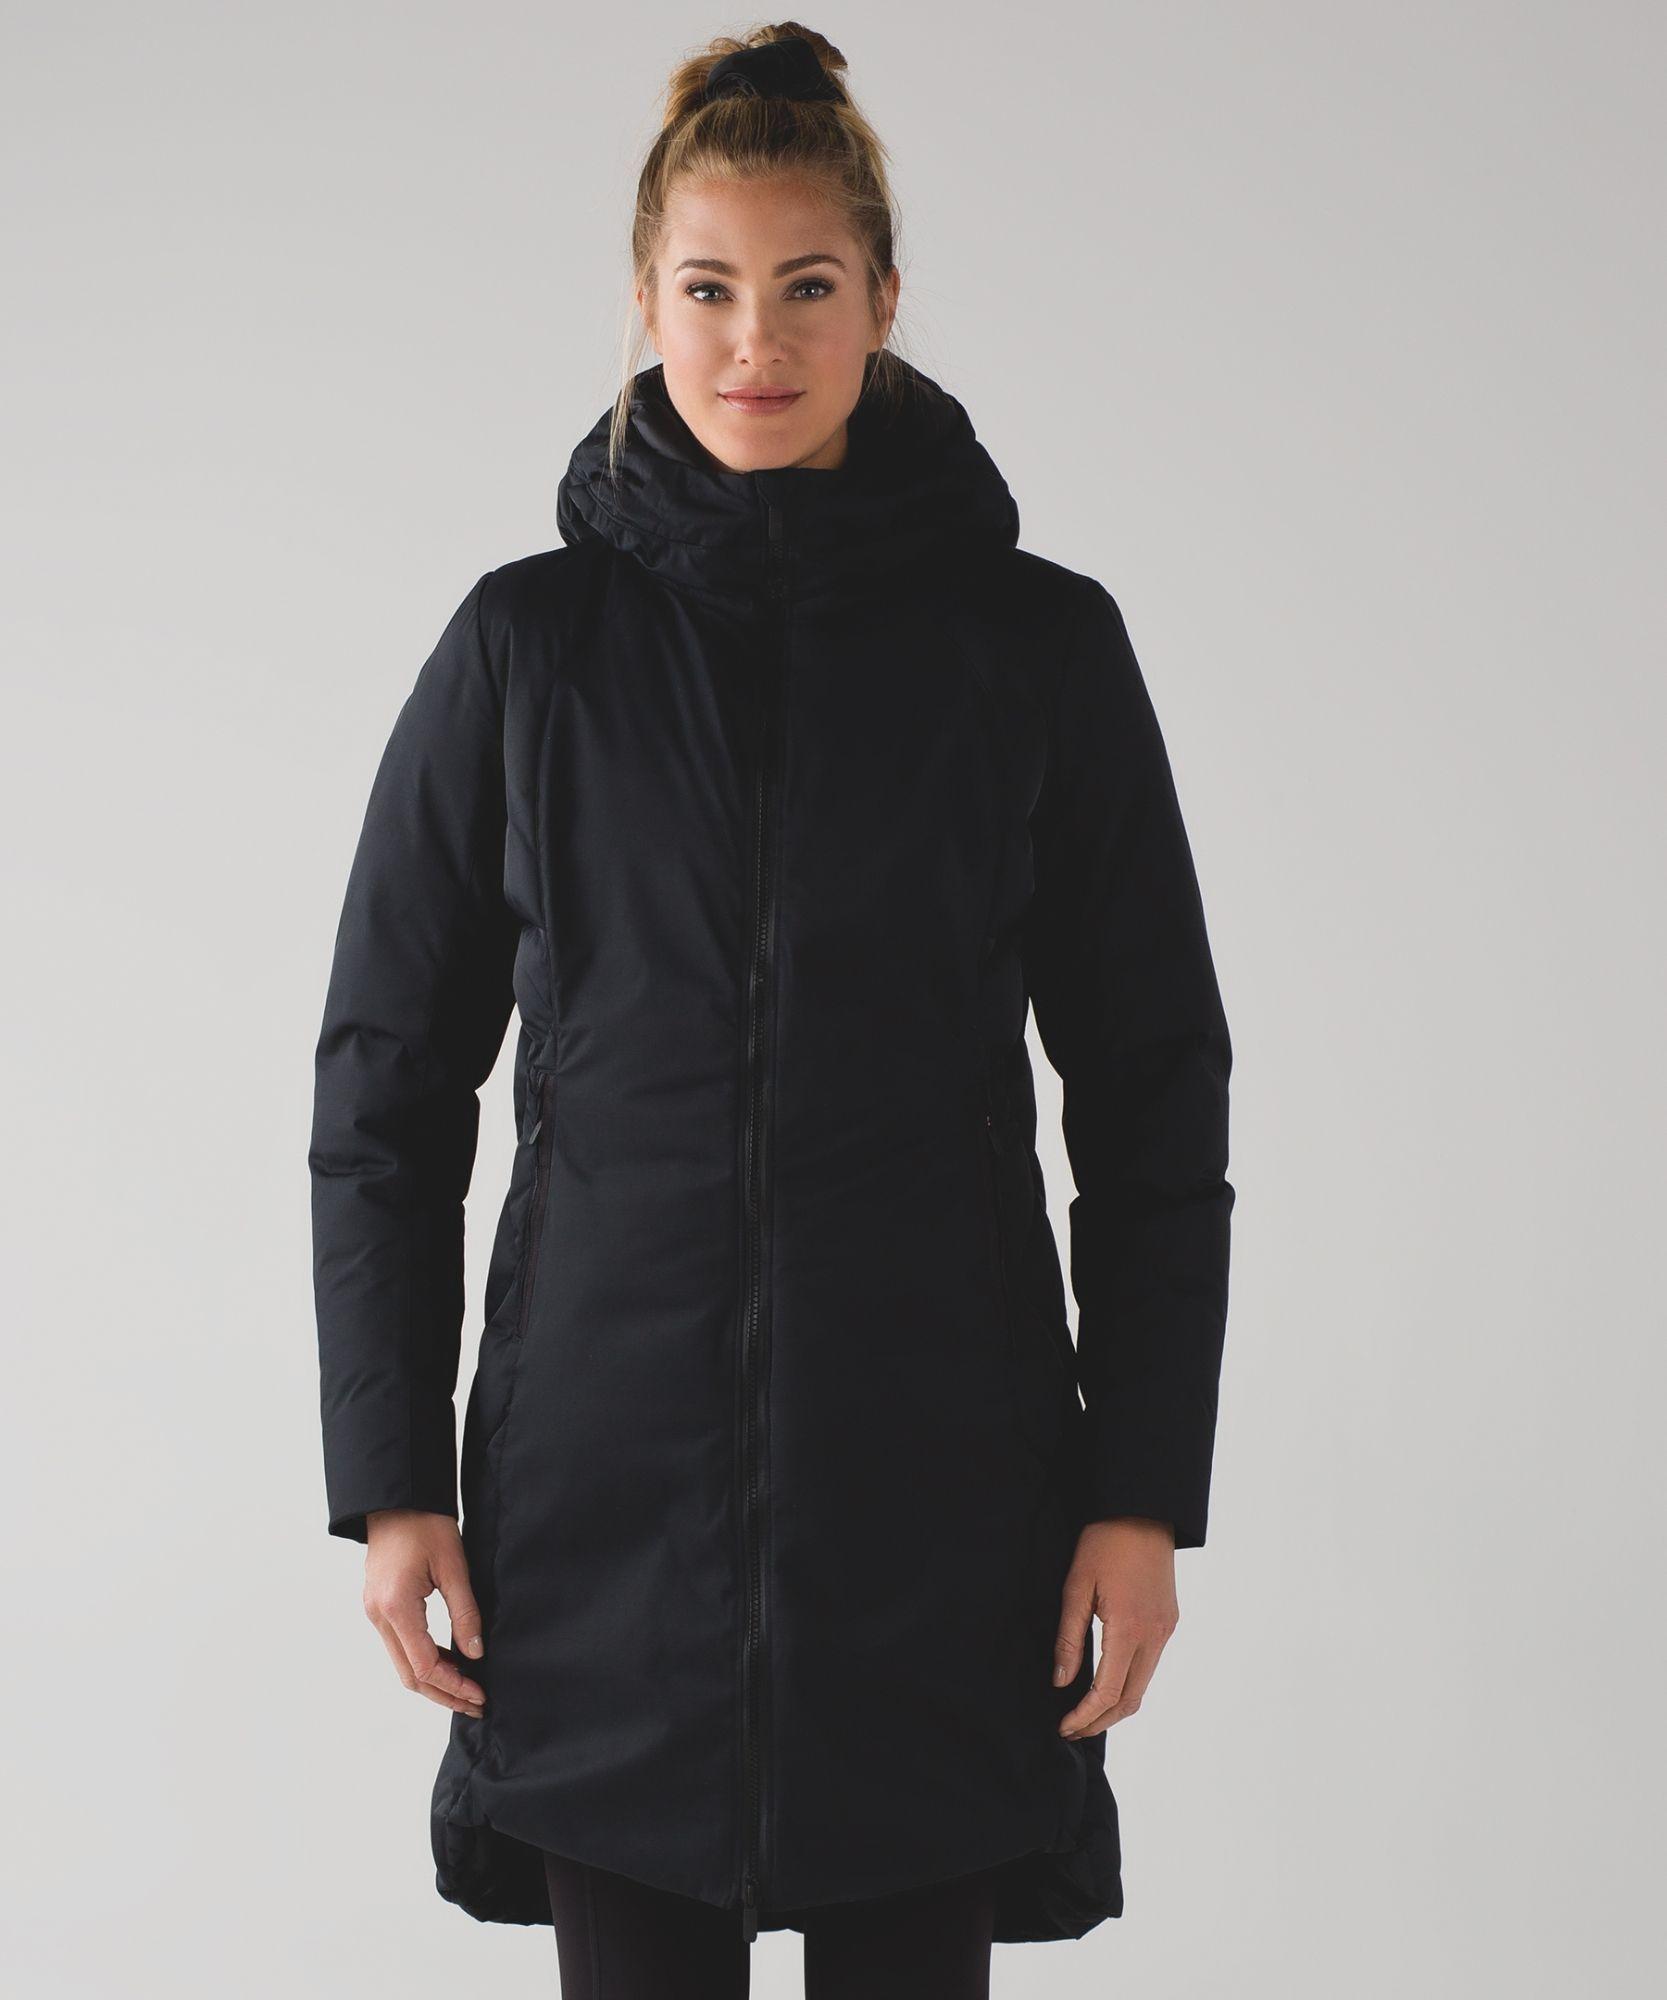 f116c509 fluff the cold parka   women's jackets + hoodies   lululemon athletica